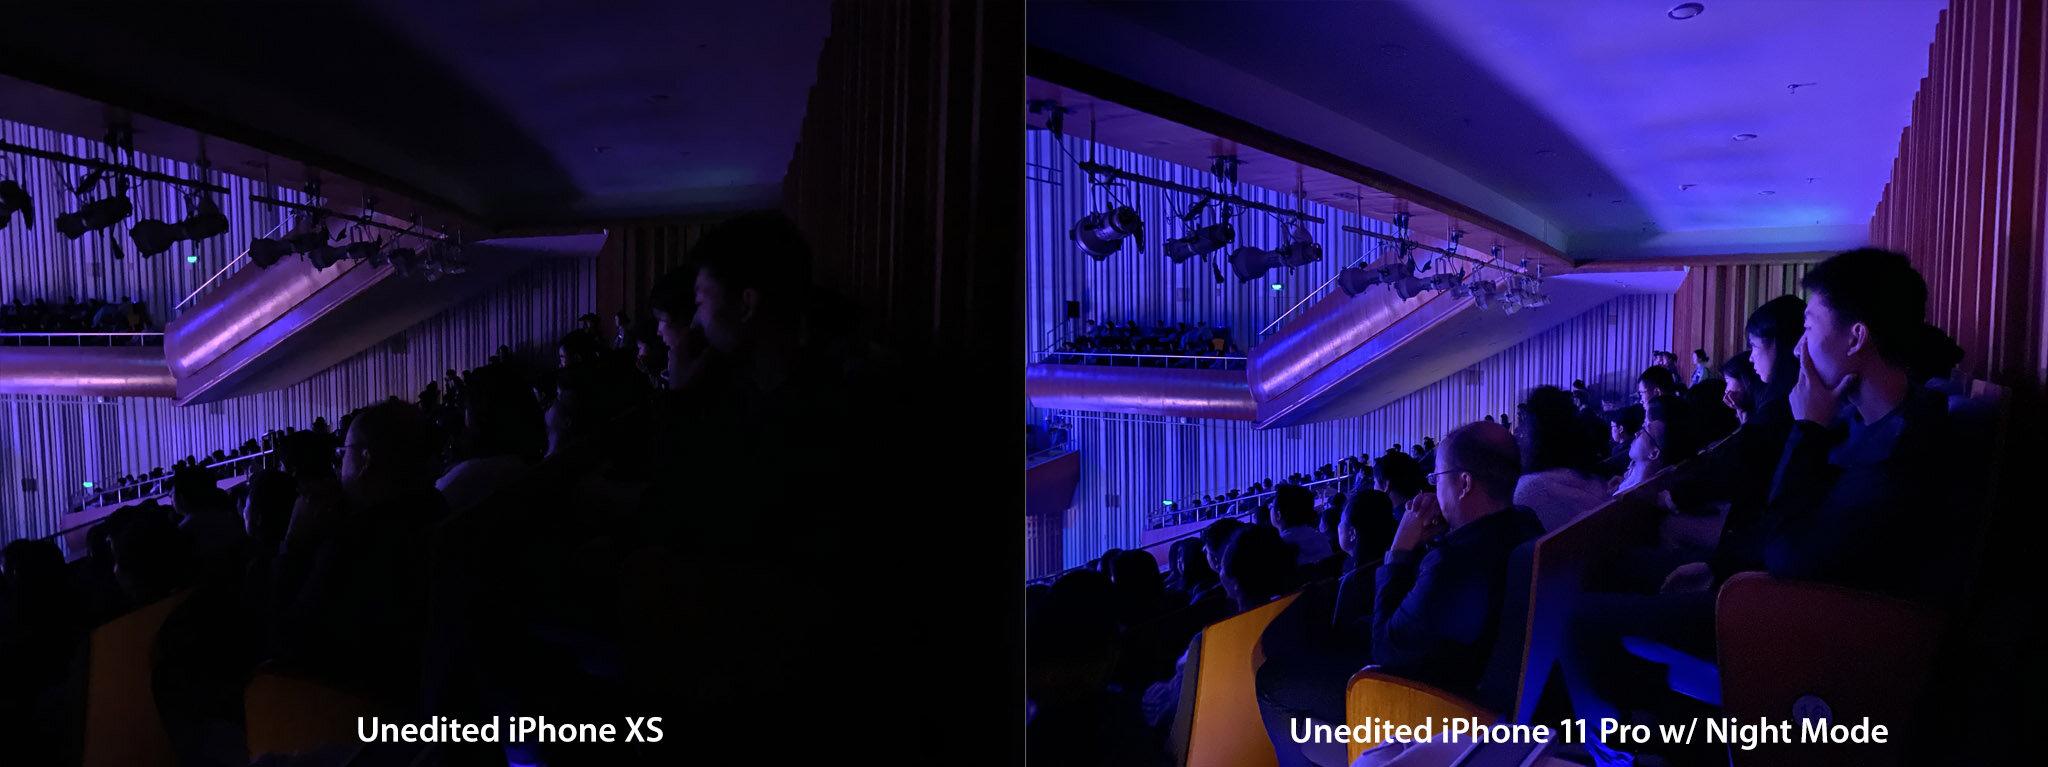 iPhone XS vs iPhone 11 Pro w/ Night mode, handheld. Xi'an, China.